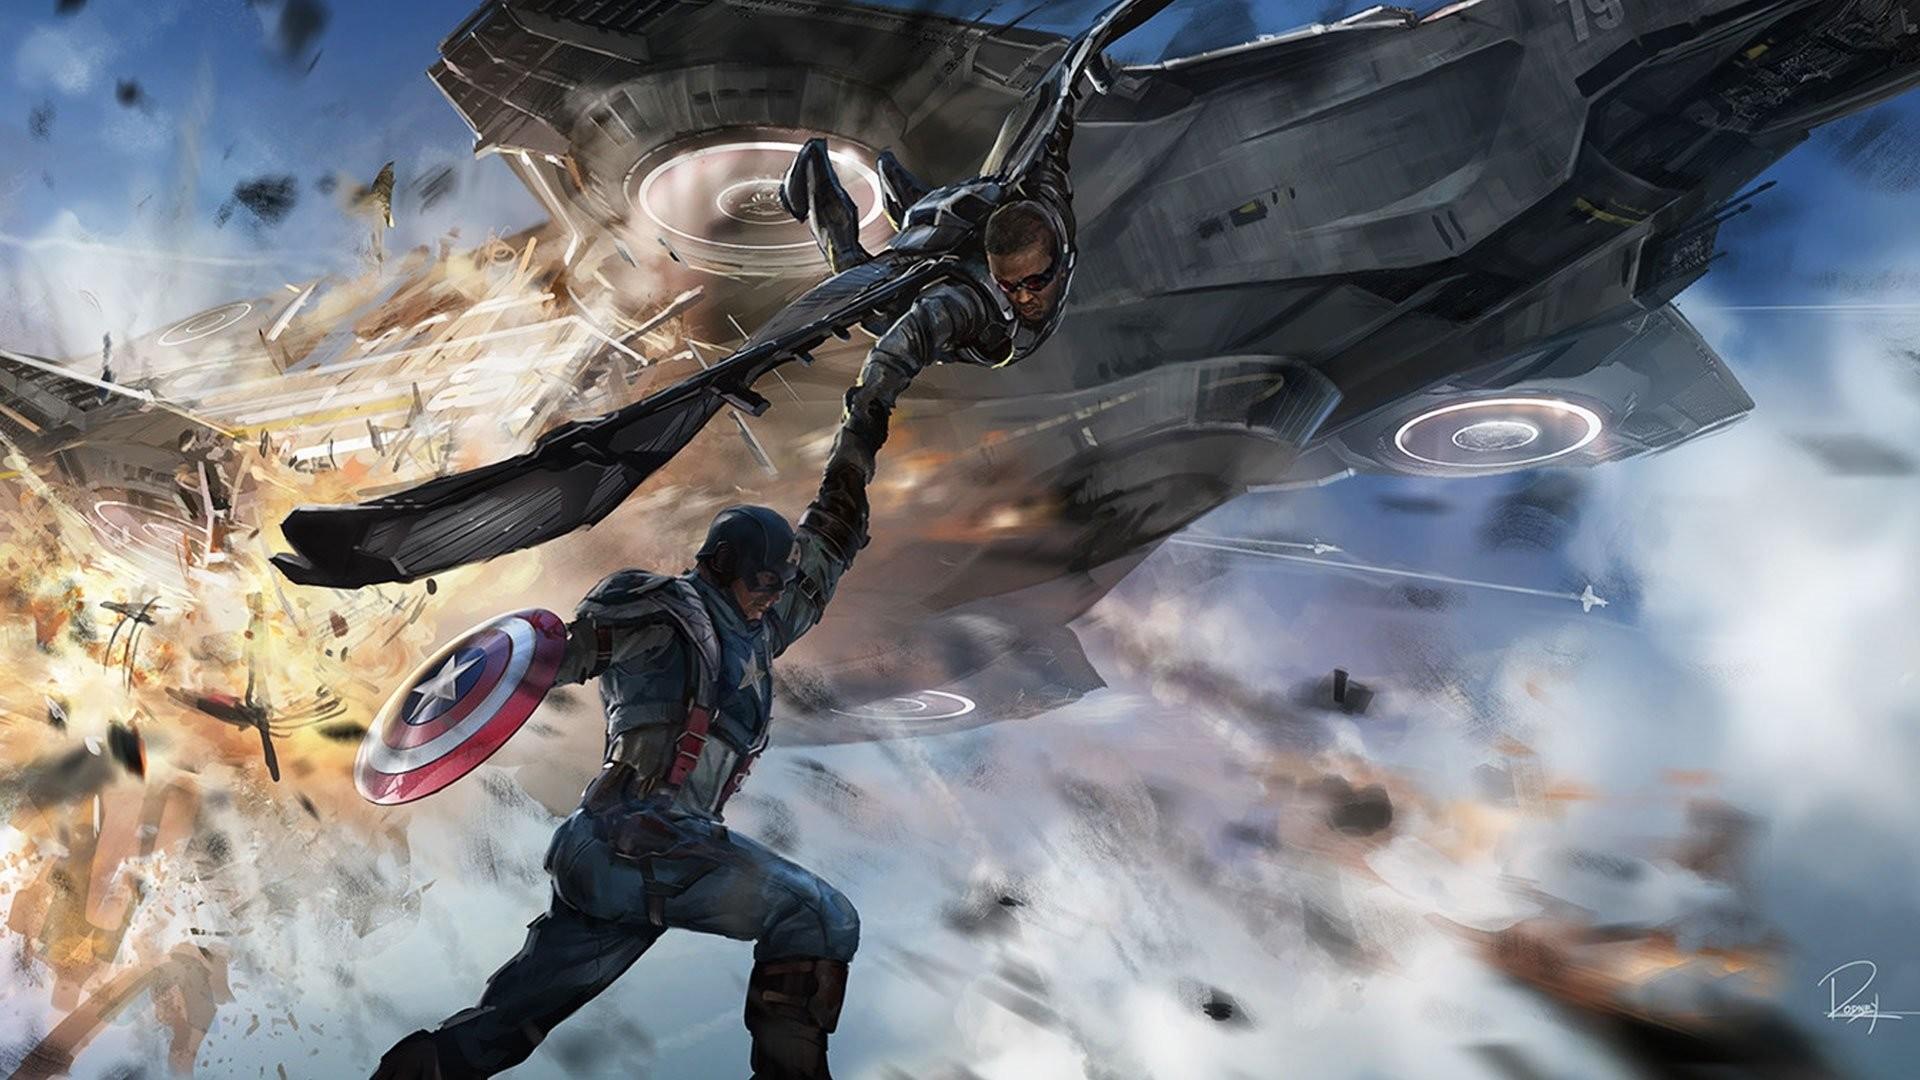 CAPTAIN AMERICA WINTER SOLDIER action adventure sci-fi superhero marvel  wallpaper     471123   WallpaperUP